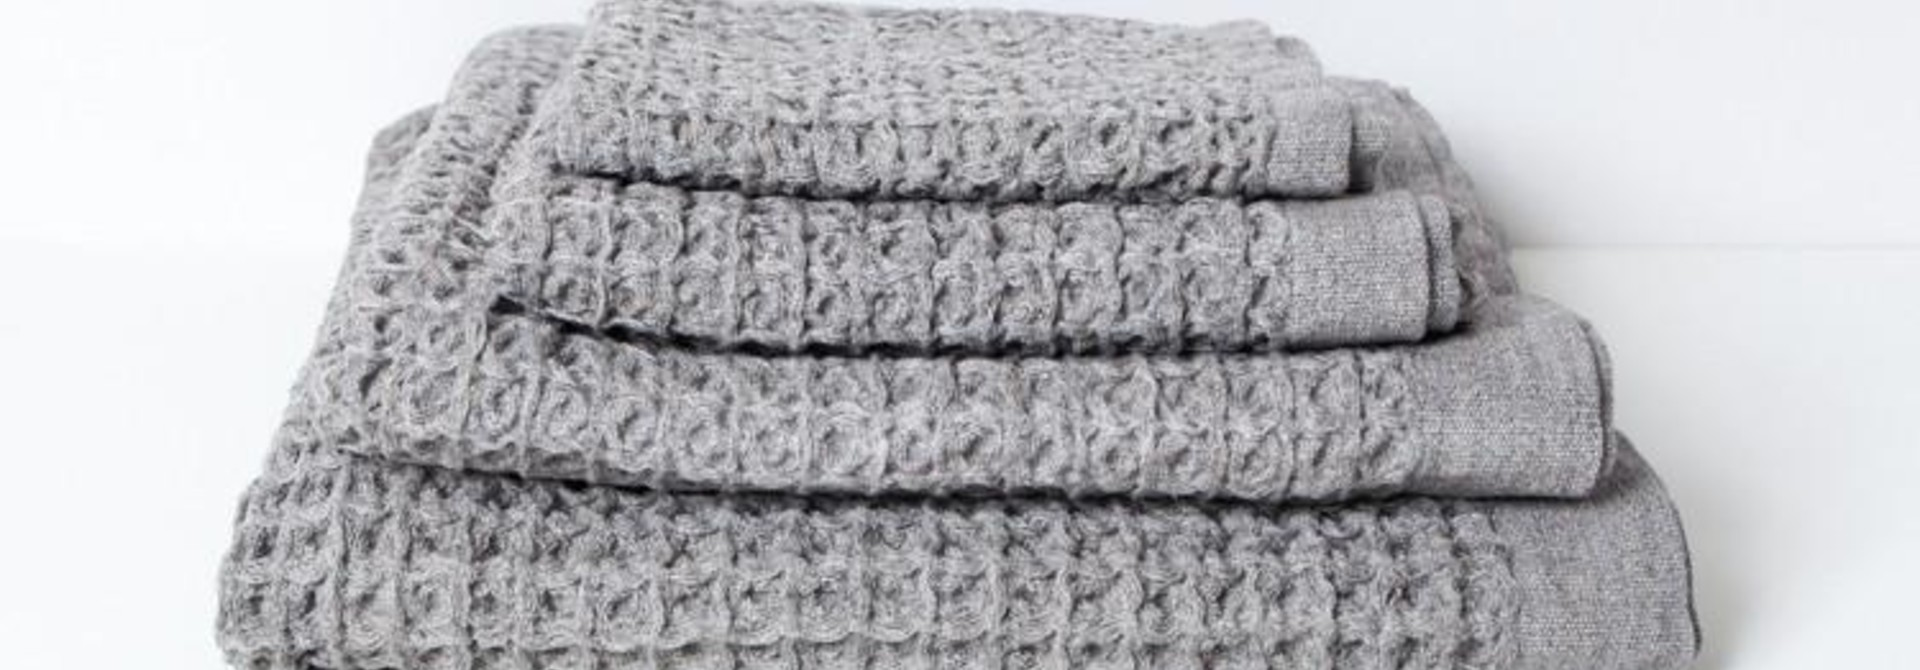 Bath Towel  - XL - Lattice - Grey